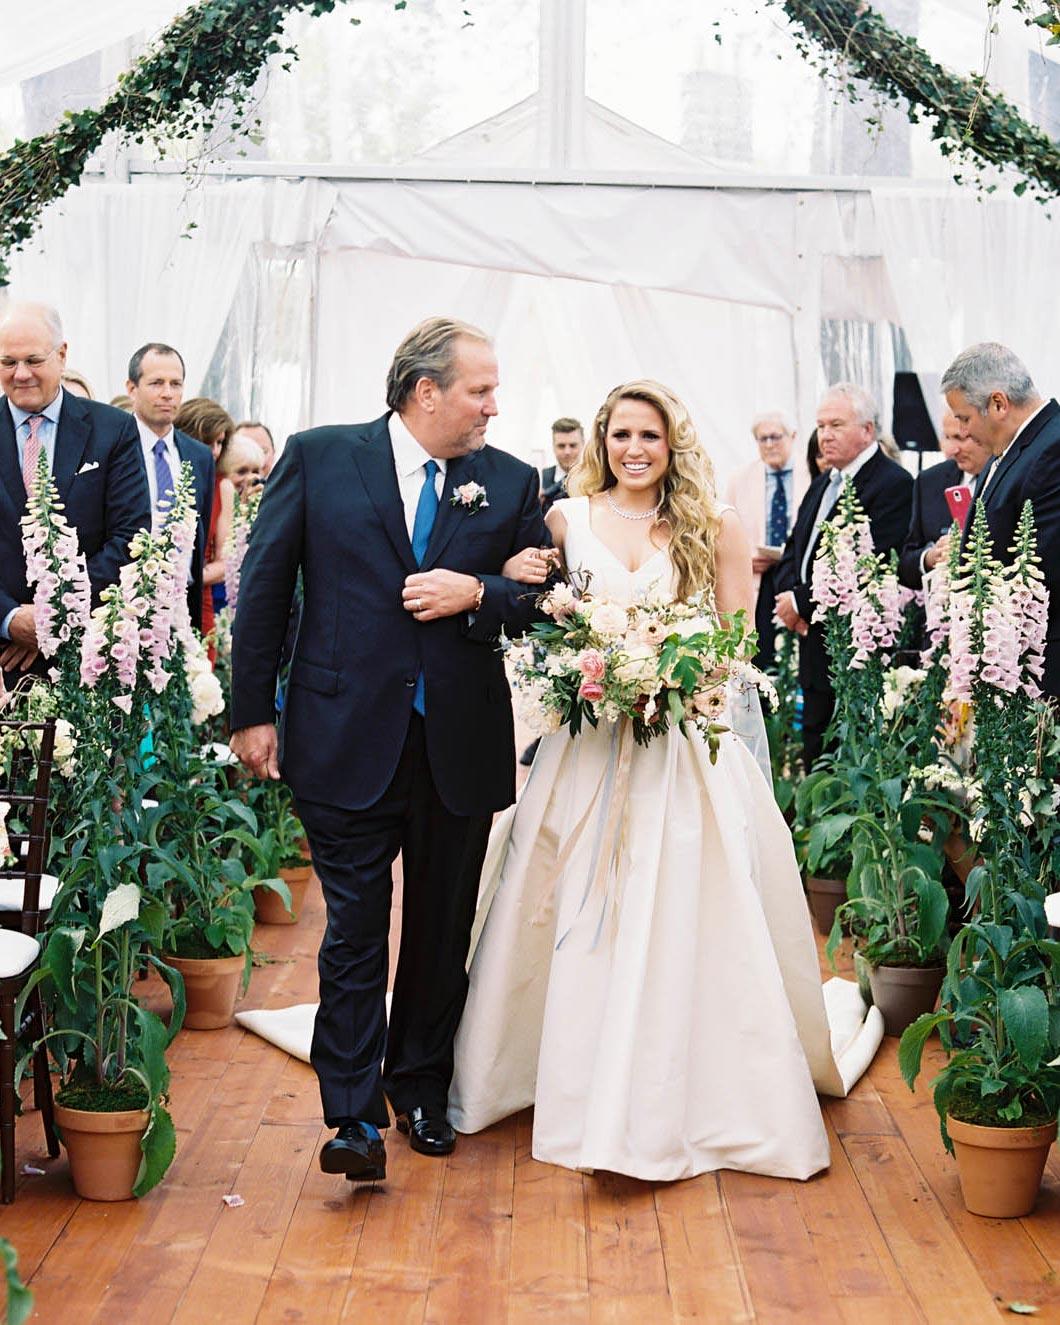 nikki-kiff-wedding-entrance-004759007-s112766-0316.jpg